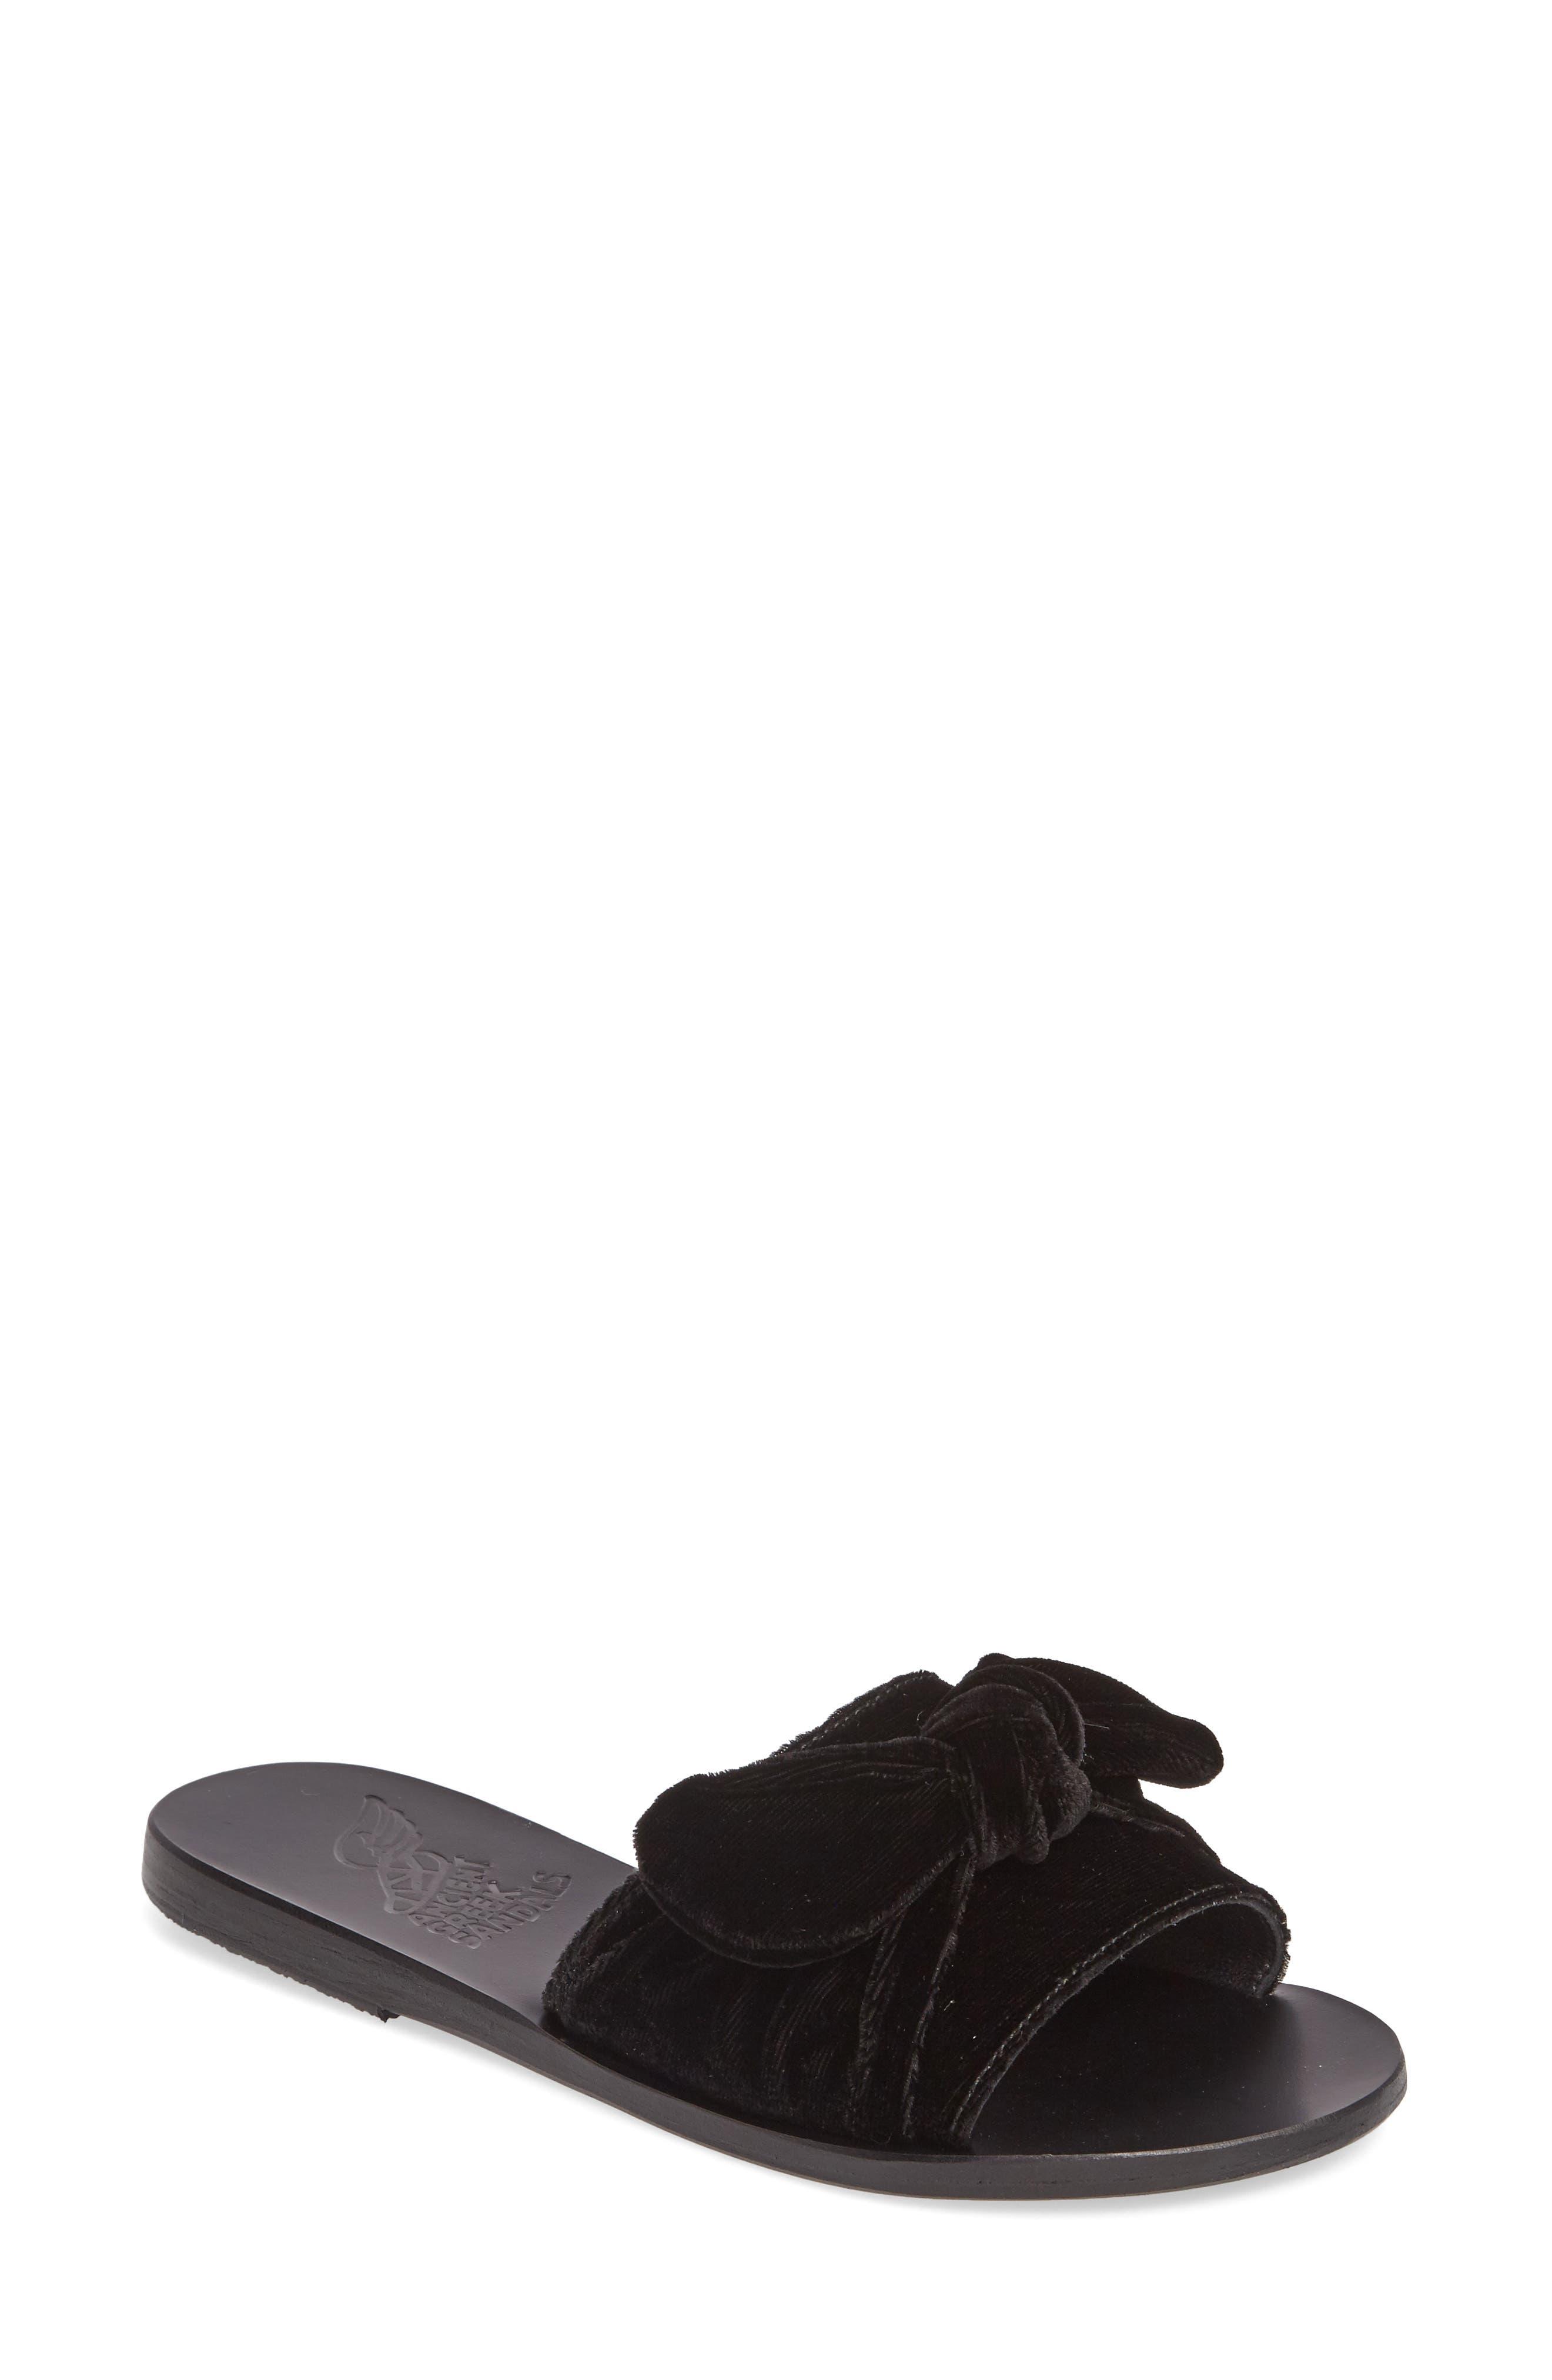 Main Image - Ancient Greek Sandals Taygete Bow Slide Sandal (Women)